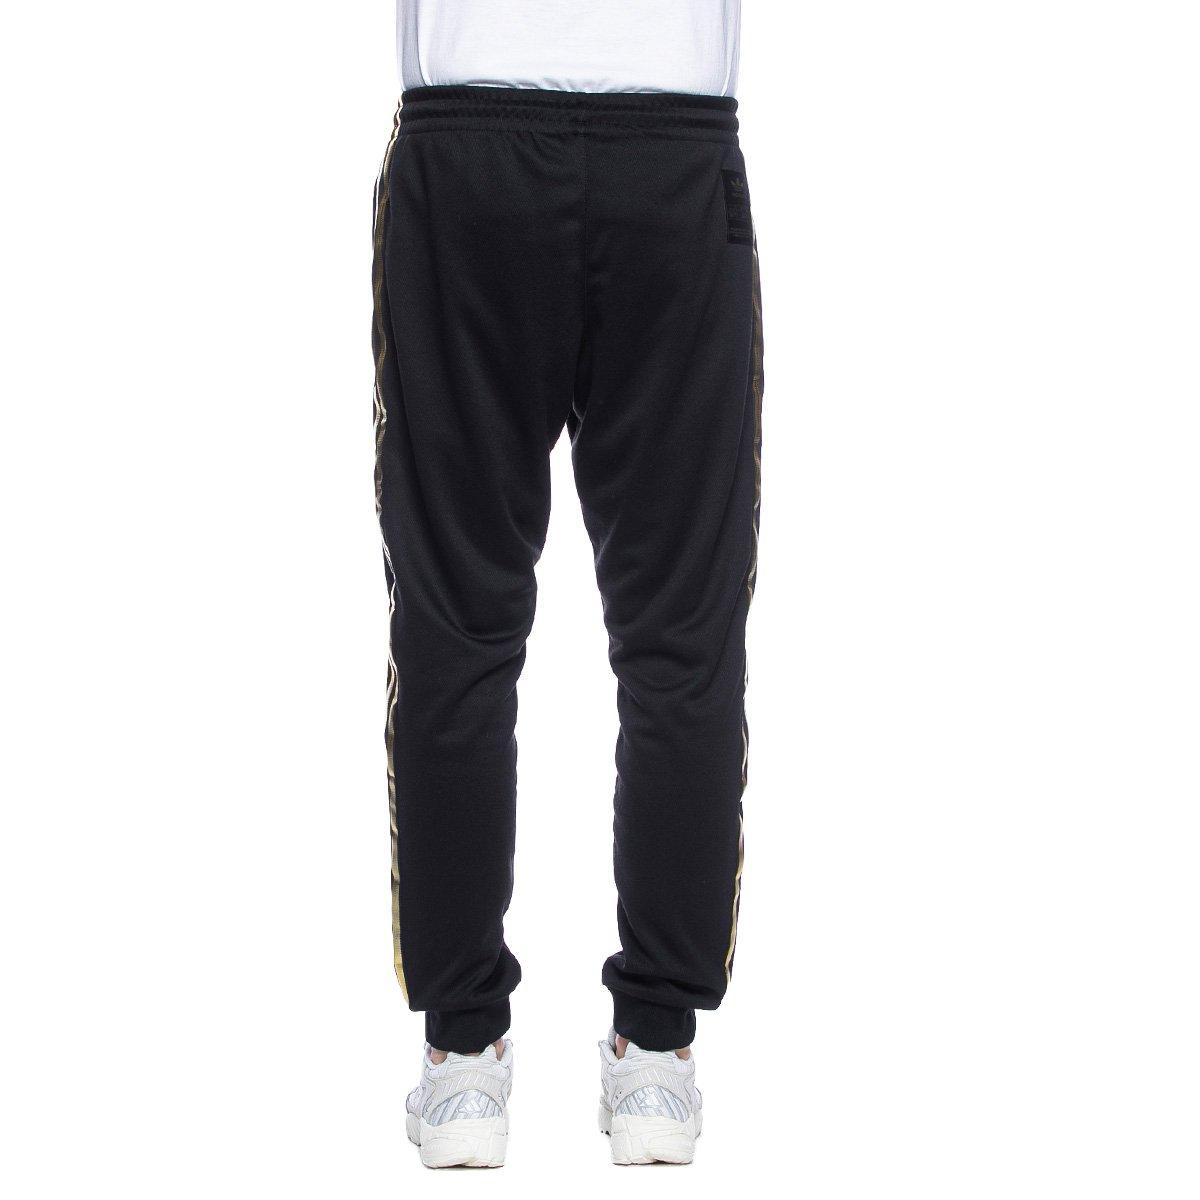 Spodnie dresowe Adidas Originals Track Pant black